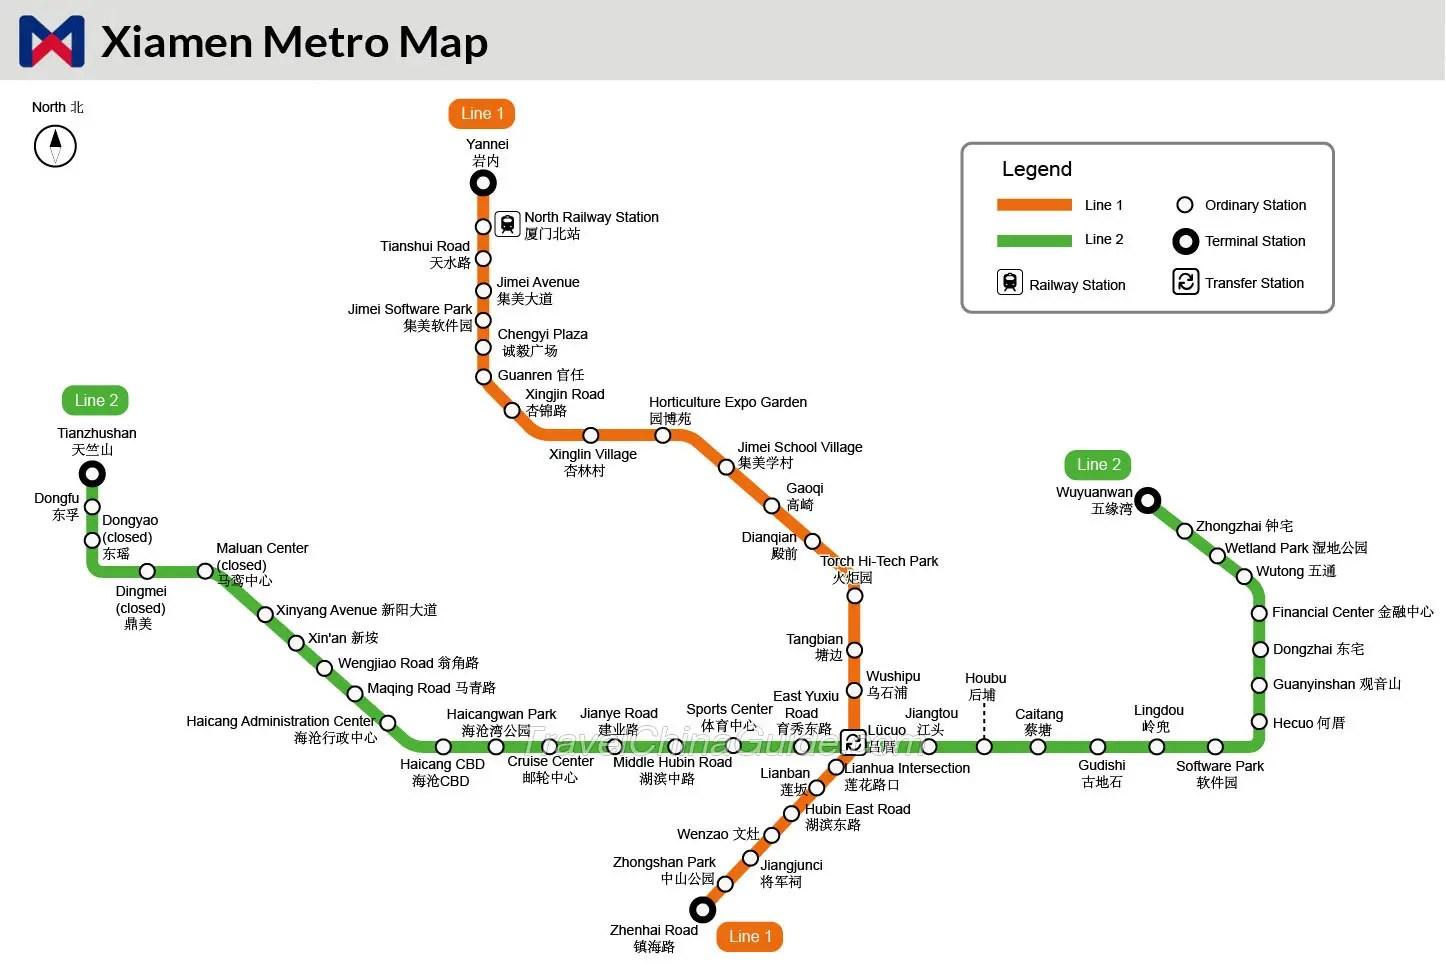 Xiamen Metro: Rail Transit, Subway Lines, Ticket Fare